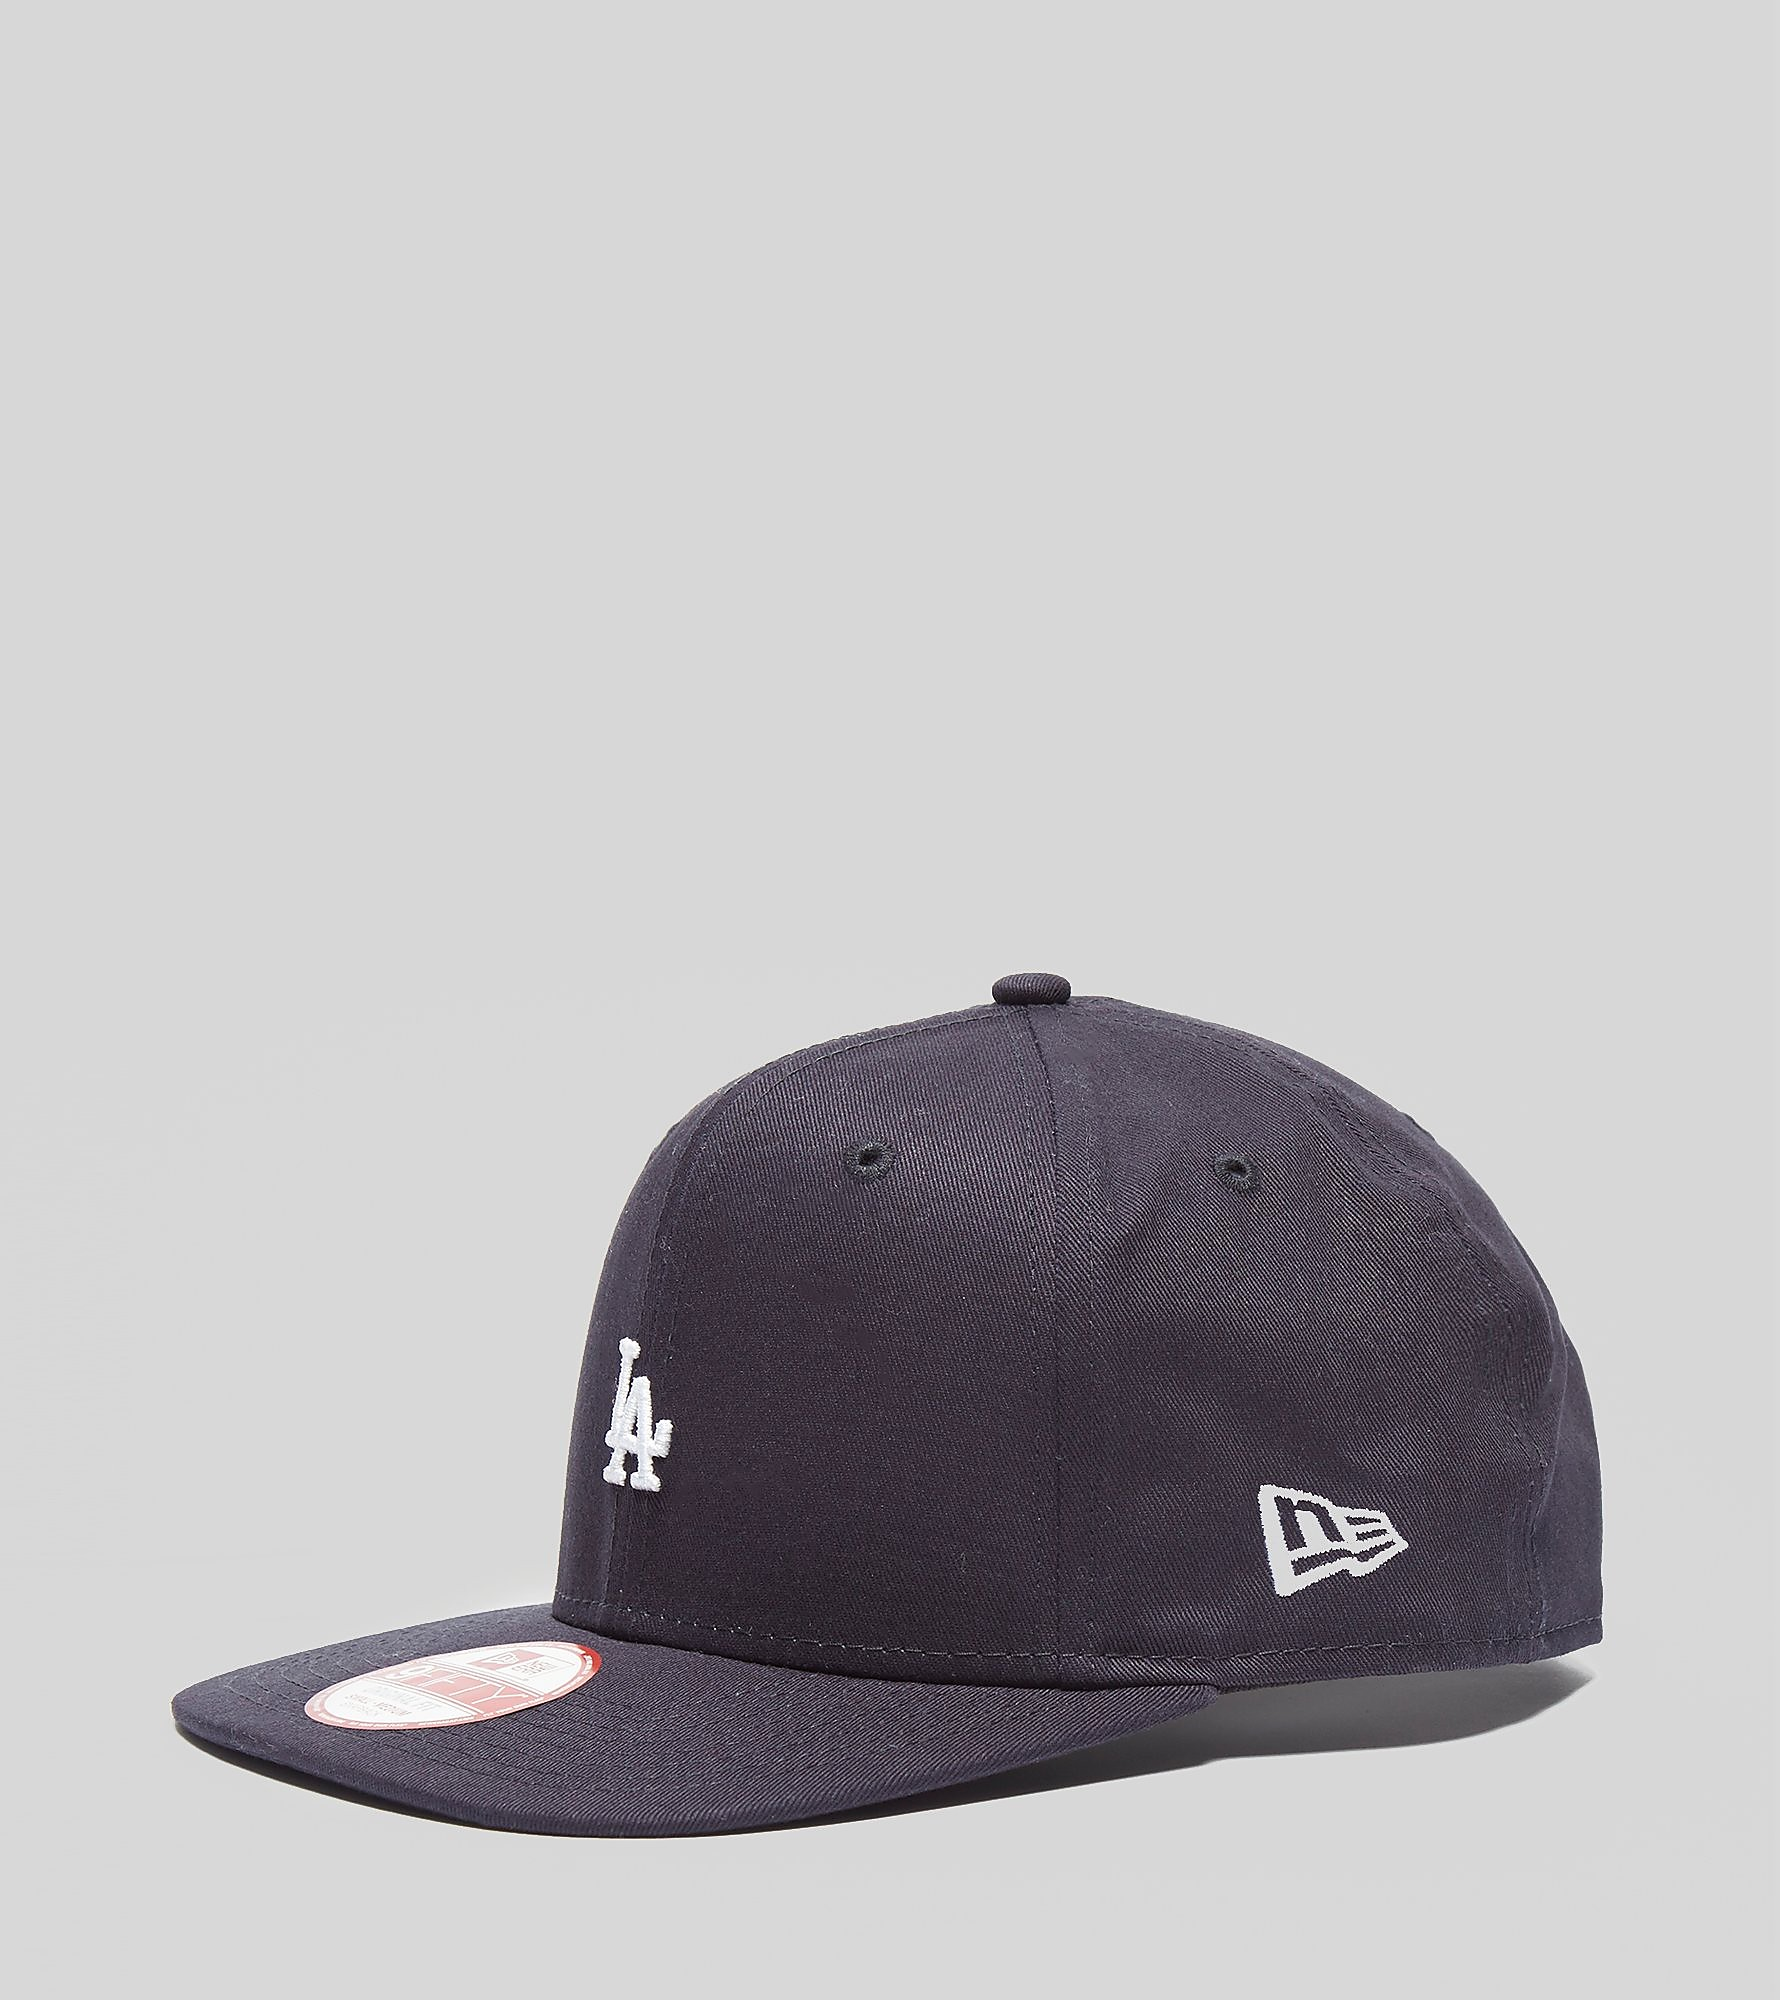 New Era 99TWENTY OG Dodgers Cap - size? Exclusive